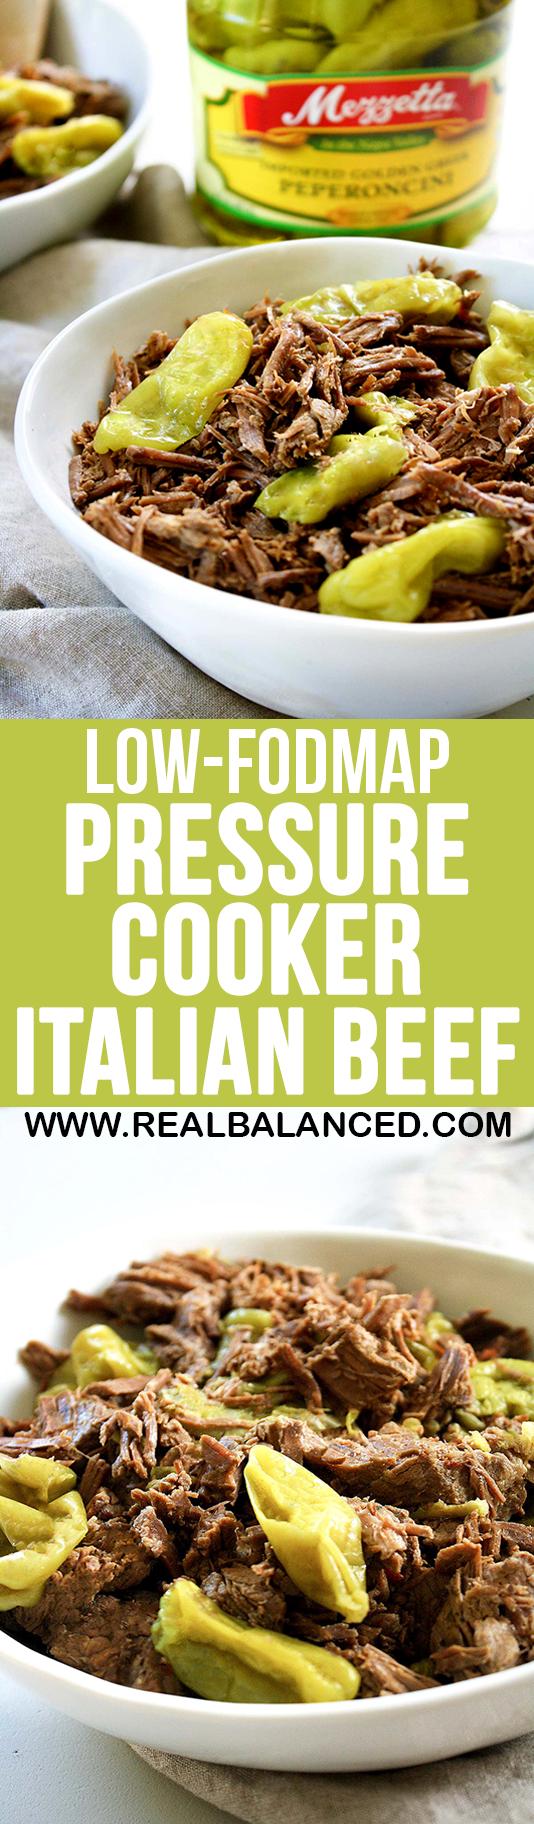 Low-FODMAP Pressure Cooker Italian Beef: low-FODMAP, low-carb, keto, gluten-free, grain-free, dairy-free, & sugar-free!